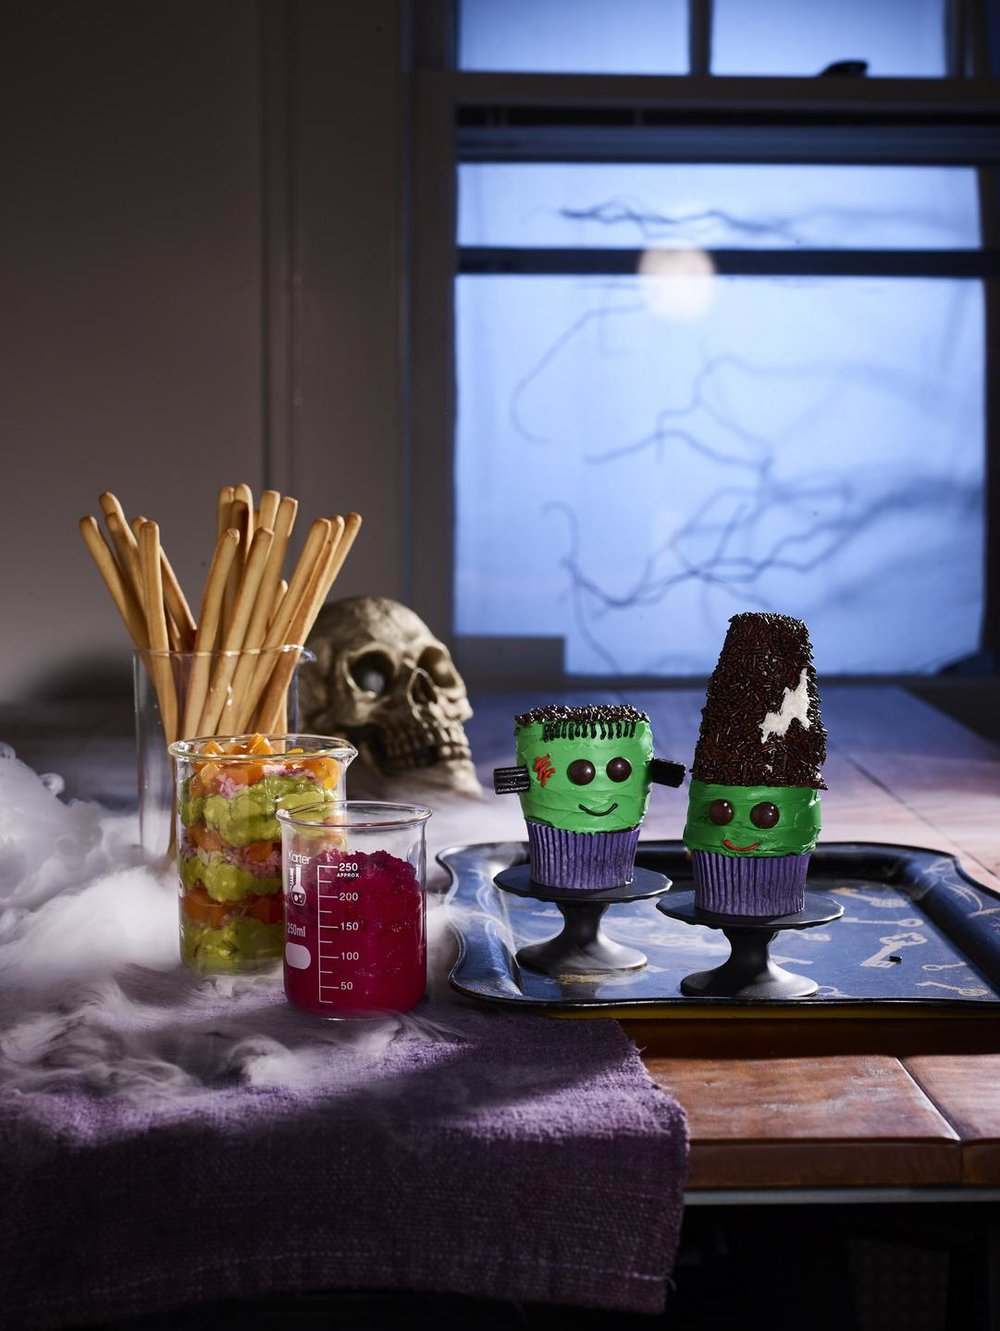 frankenstein cupcakes.jpg